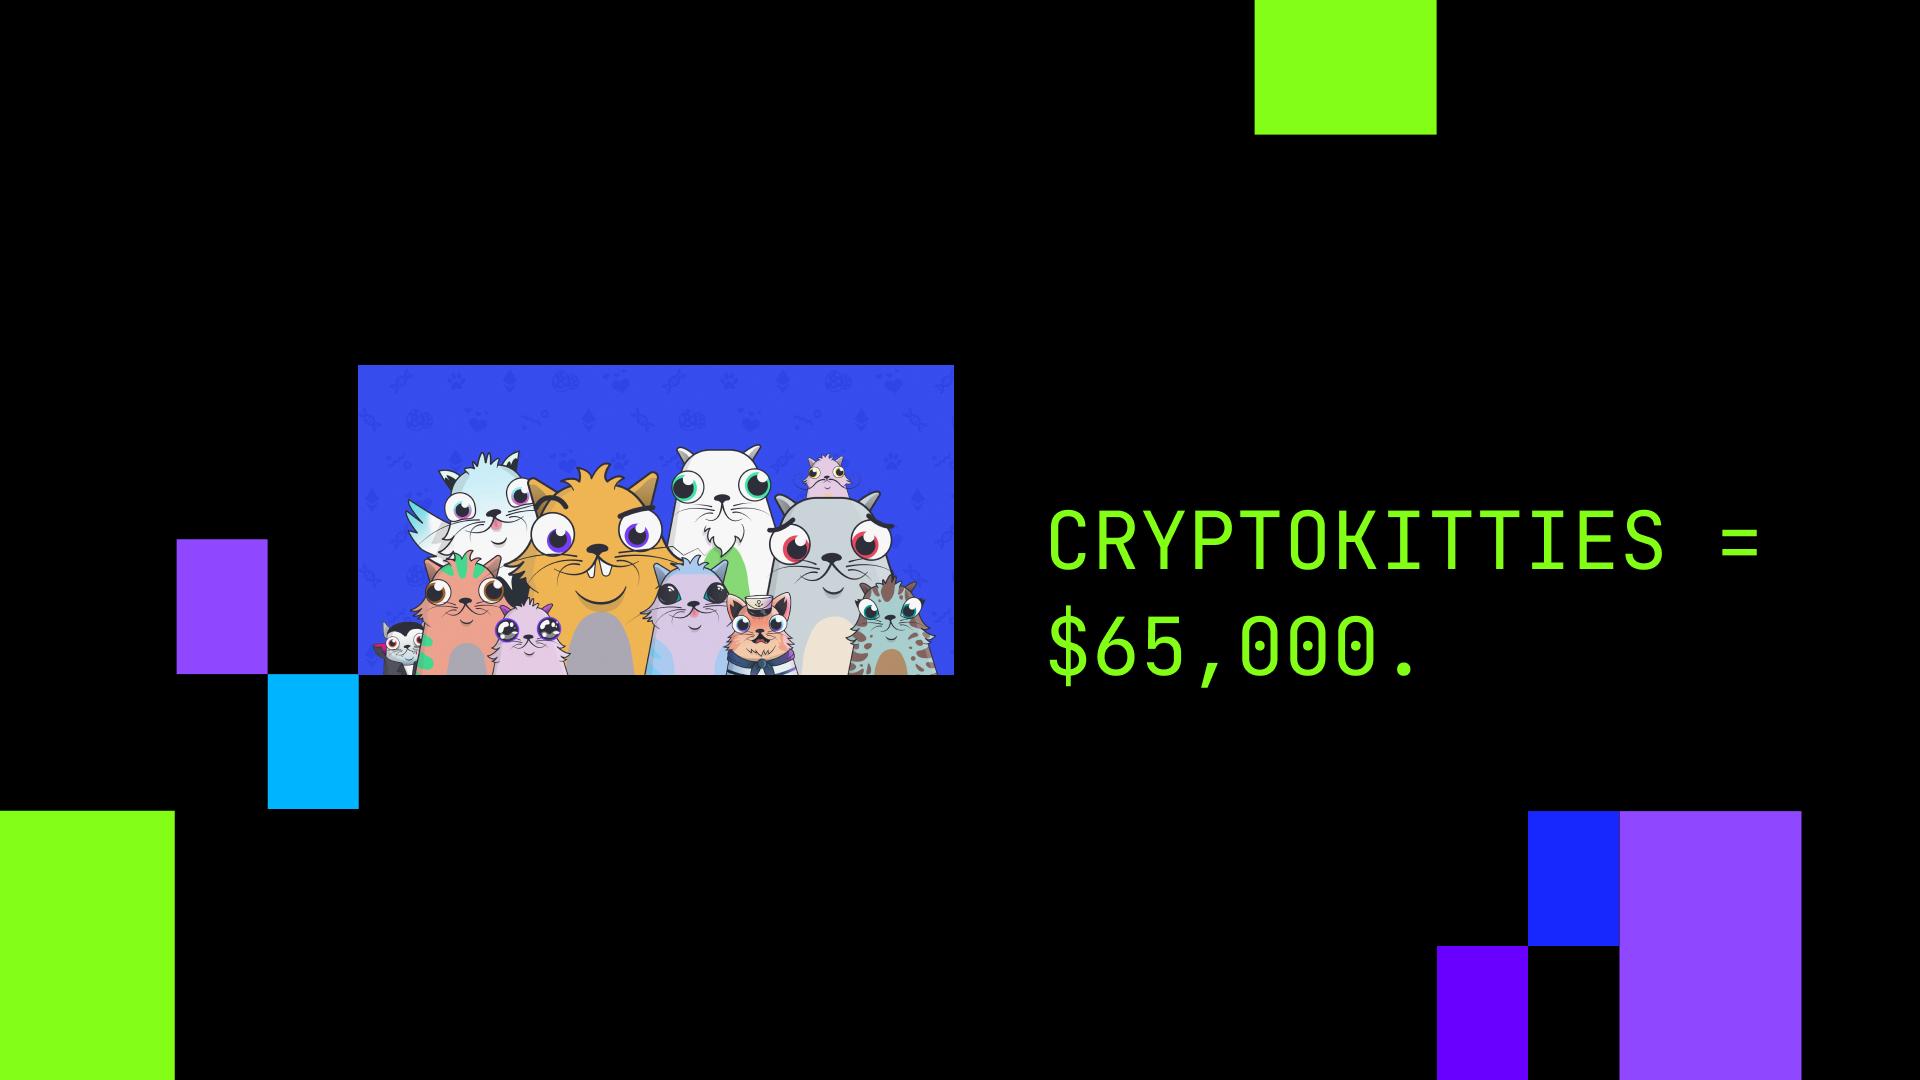 CryptoKitties = $65,000